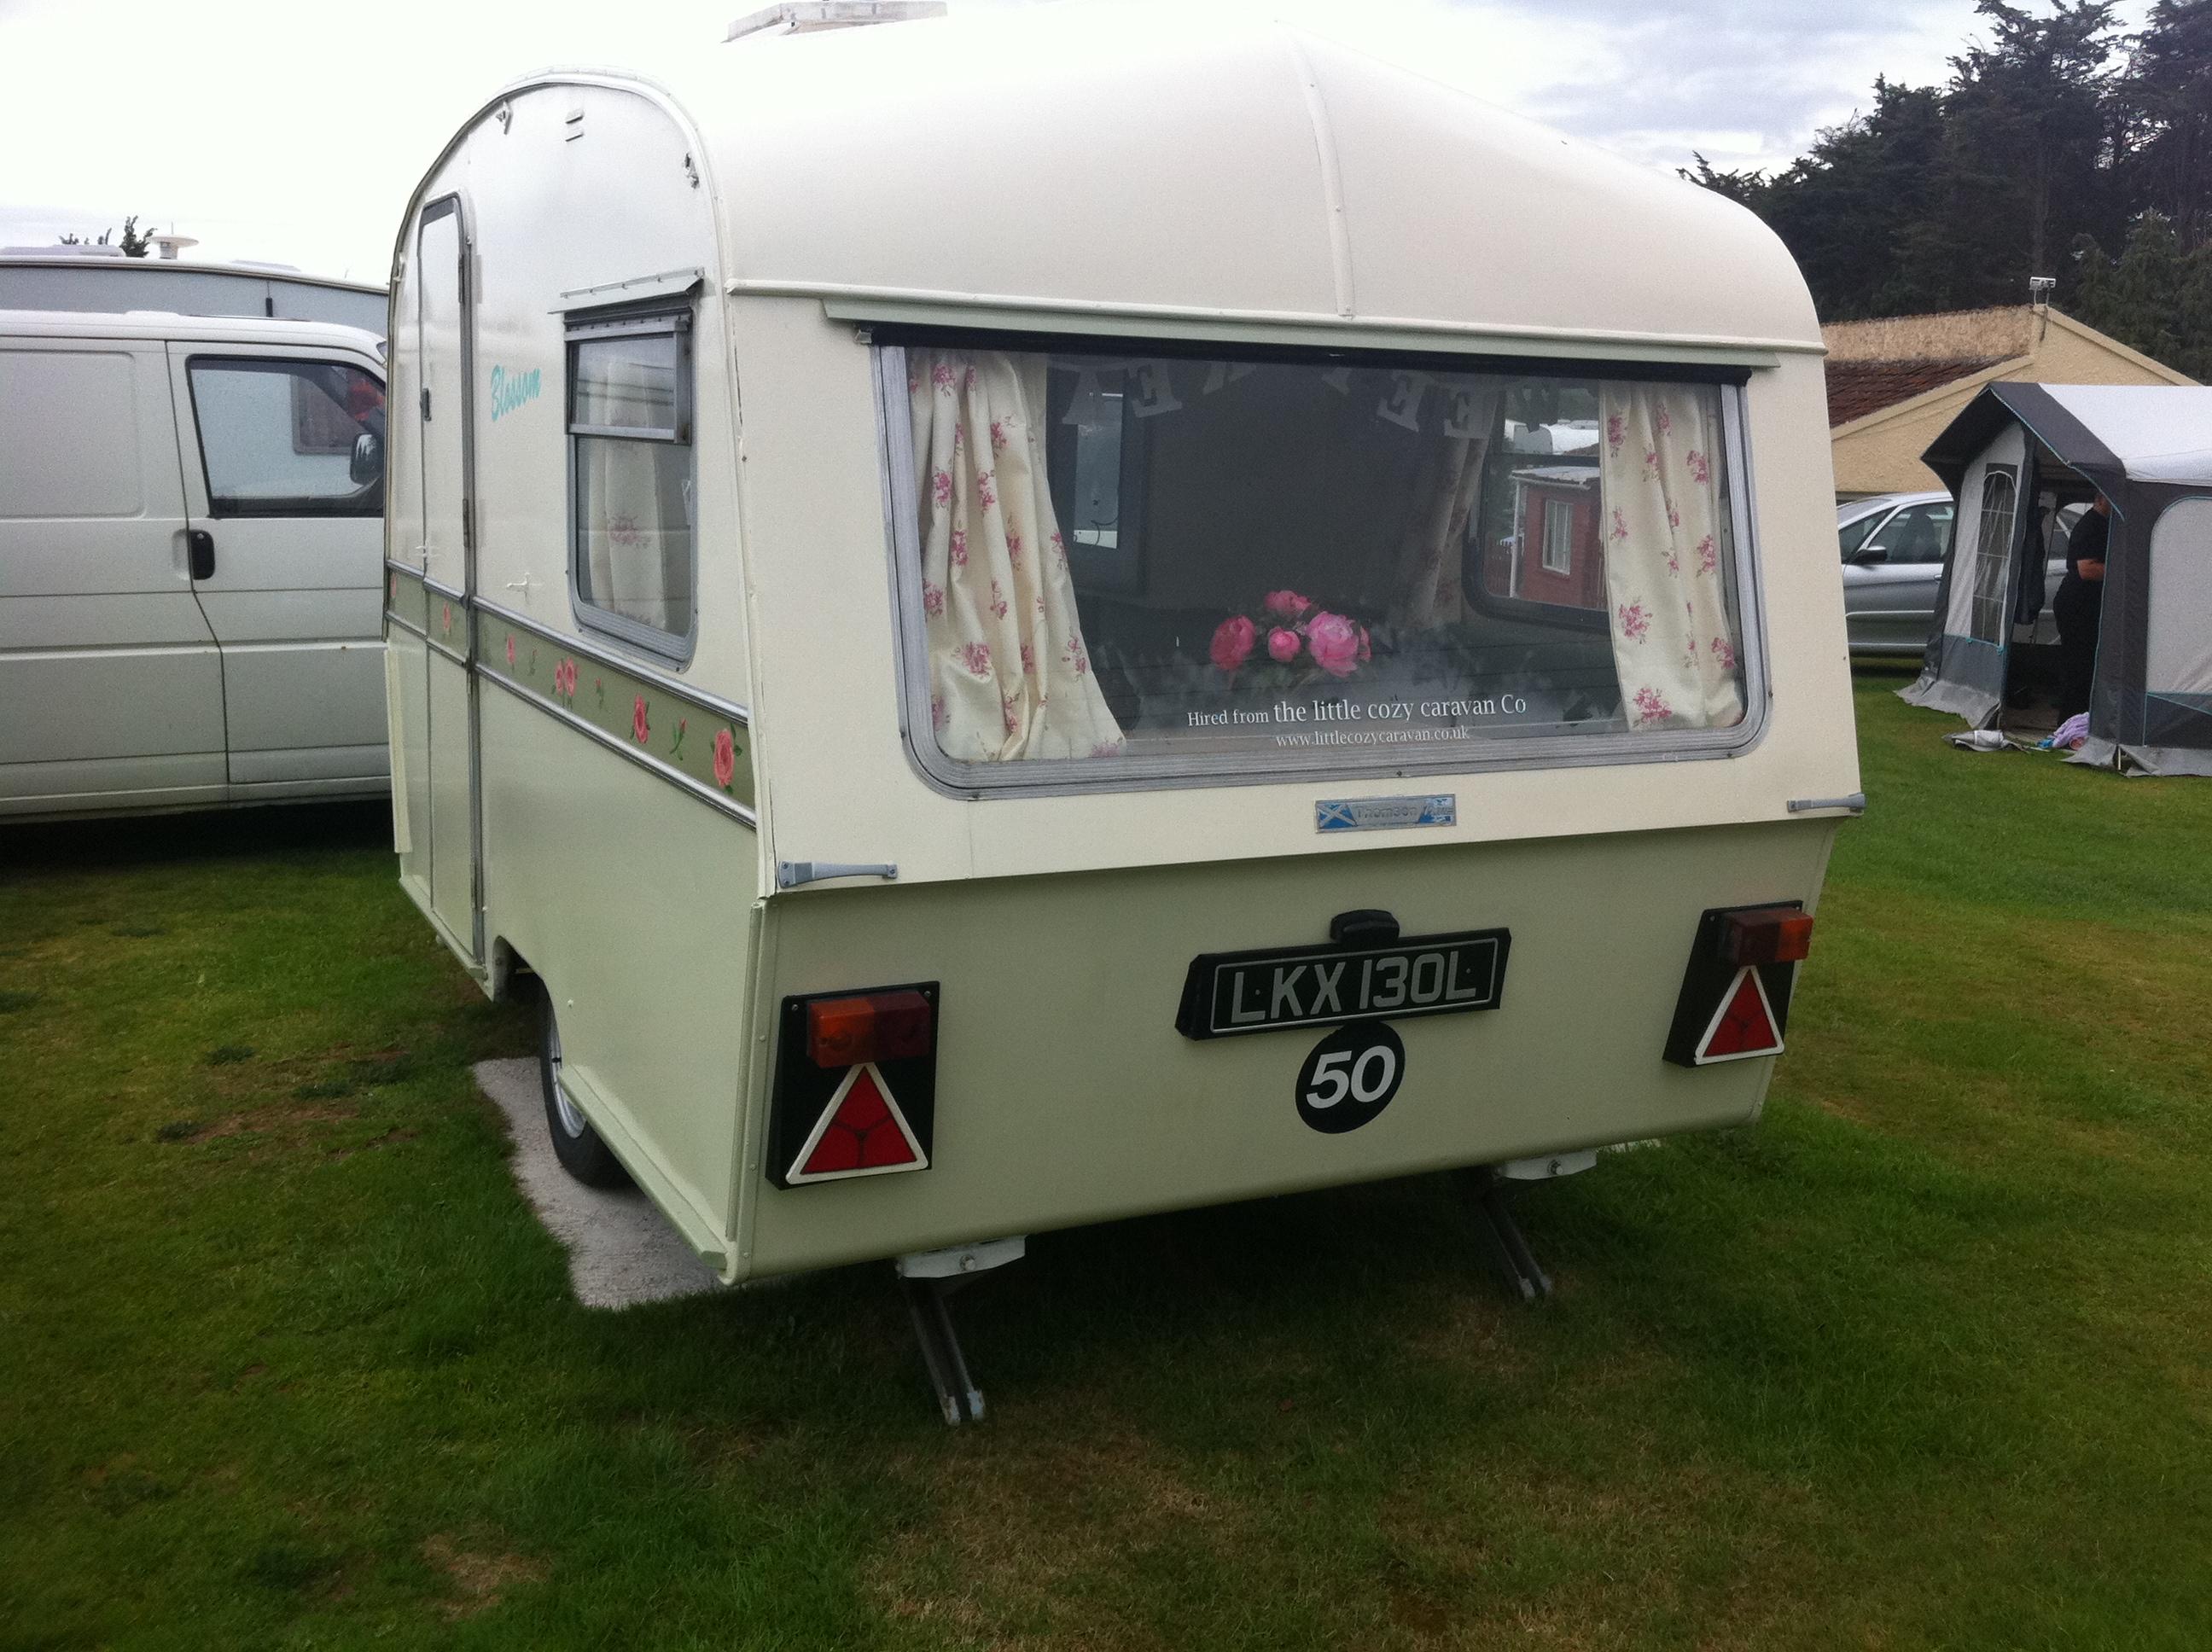 Model Bedroom Caravan For Hire At Butlins Minehead